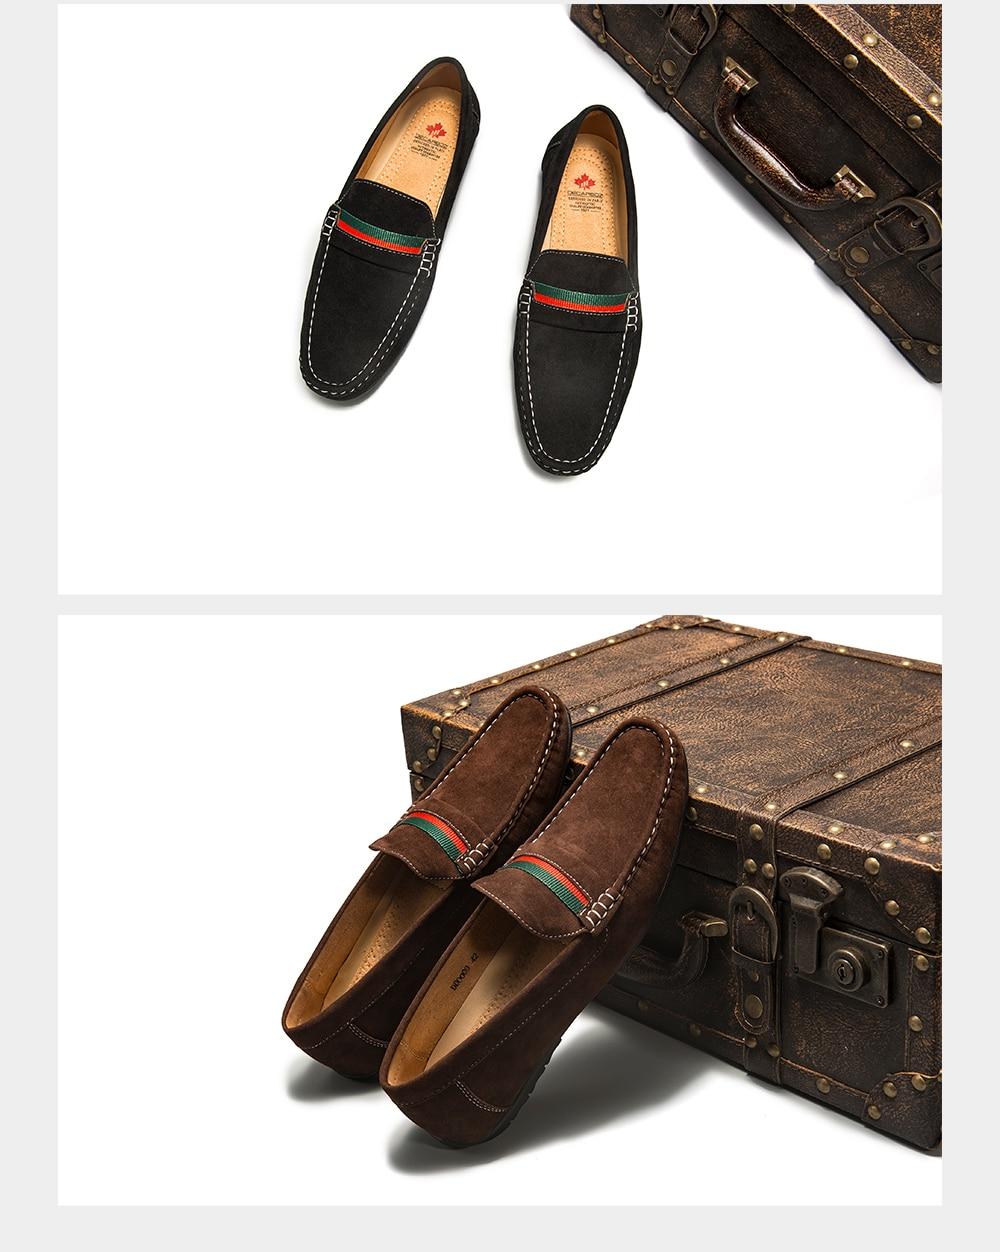 H728775e5763f4cfca0c0f9a3280048c7N Men Loafers shoes 2020 Autumn Fashion Moccasins Footwear Suede Slip-On Brand Men's Shoes Men Leisure Walking Men's Casual Shoes